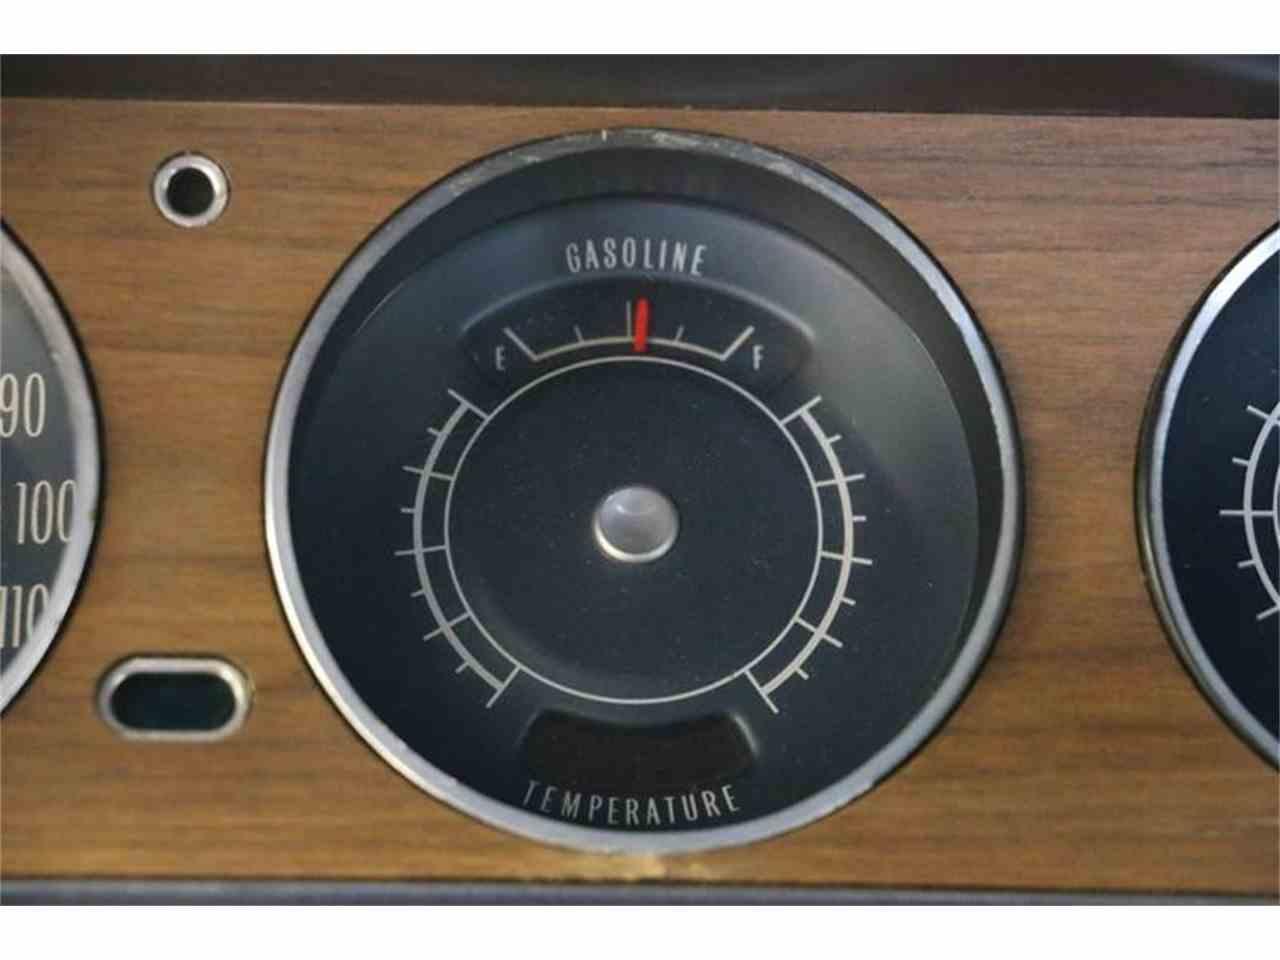 1967 Gto Rally Gauge Wiring Diagram Wiring Diagram 65 GTO Wiring-Diagram  Wiring Diagram 1965 Pontiac Gto